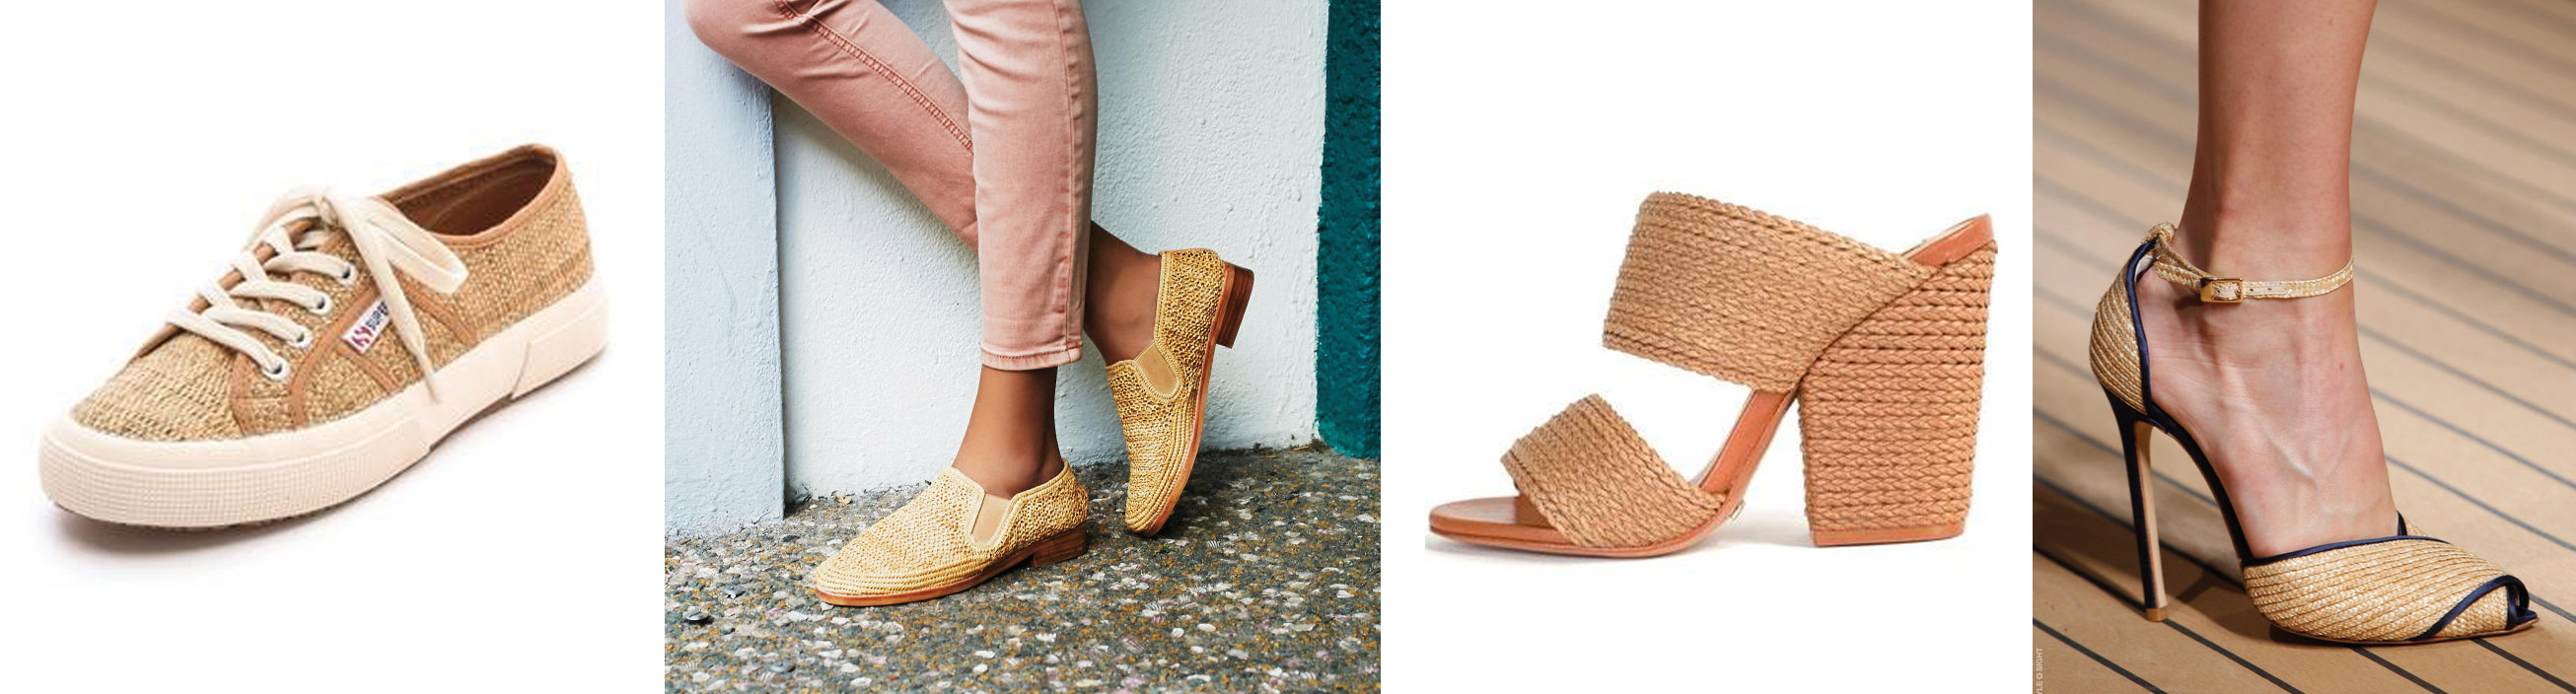 78a70e3bc451c Zapatos clave de mujer para primavera-verano 2016